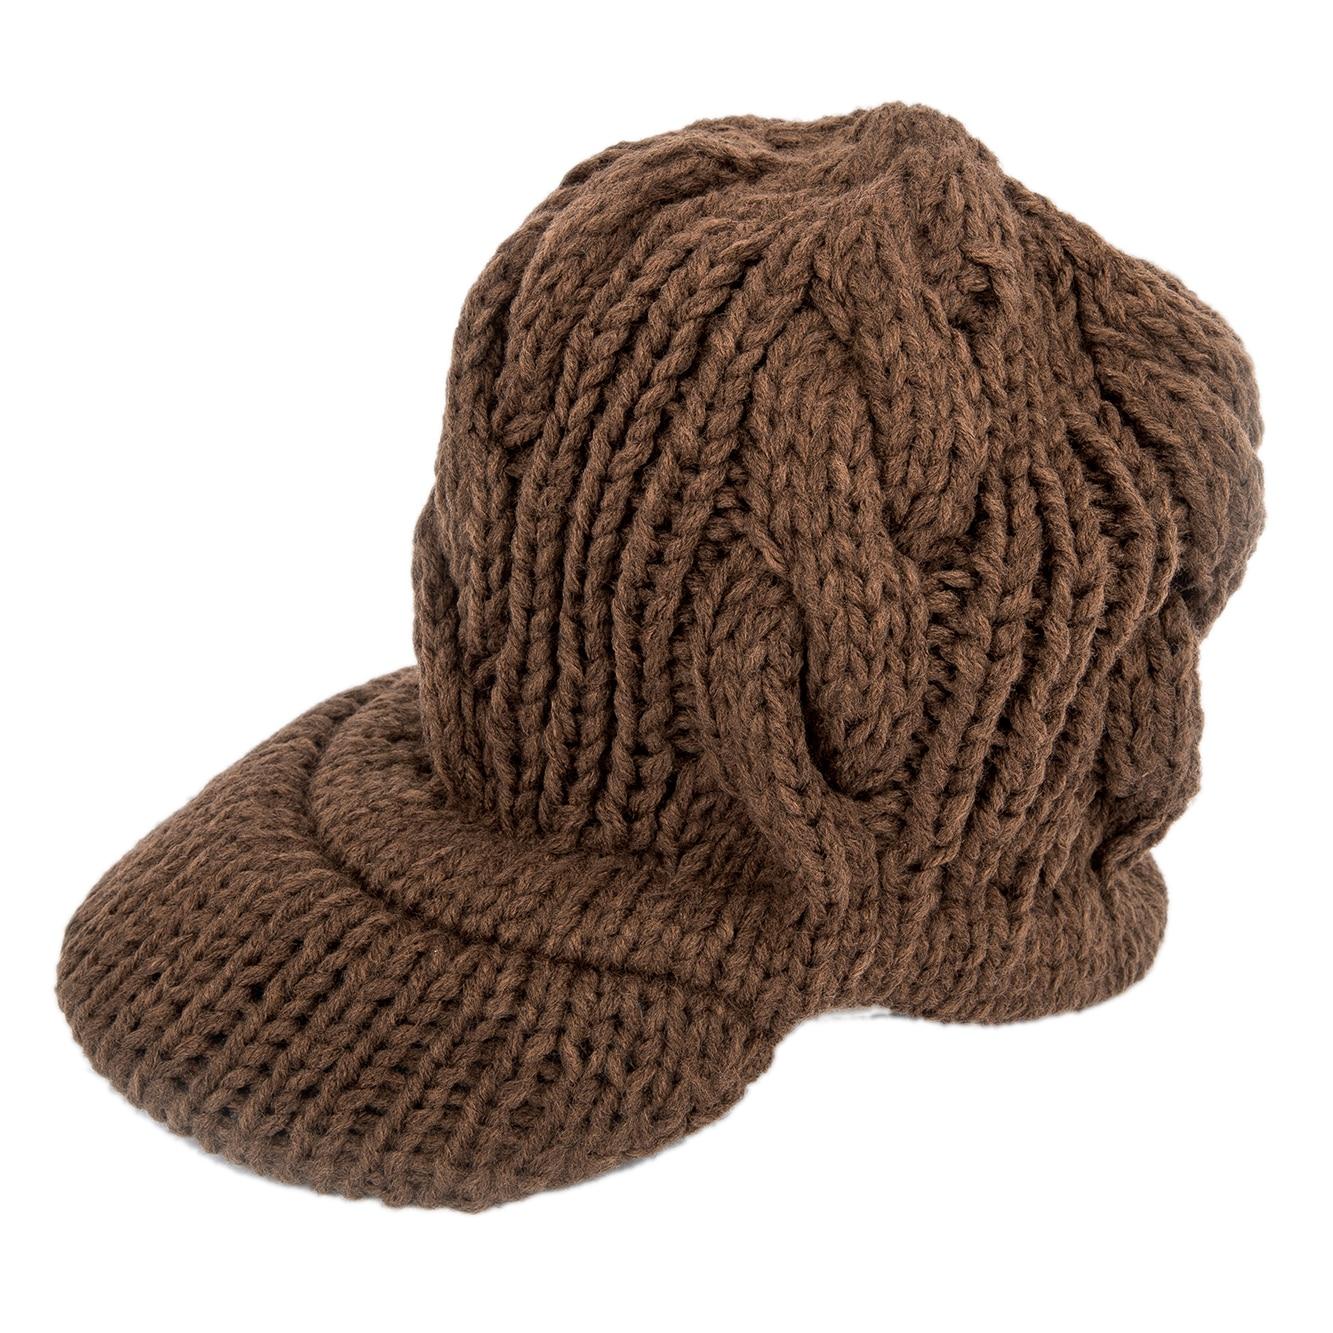 ▽Caliente mujeres slouchy patrón knit Beanie ganchillo costilla ...